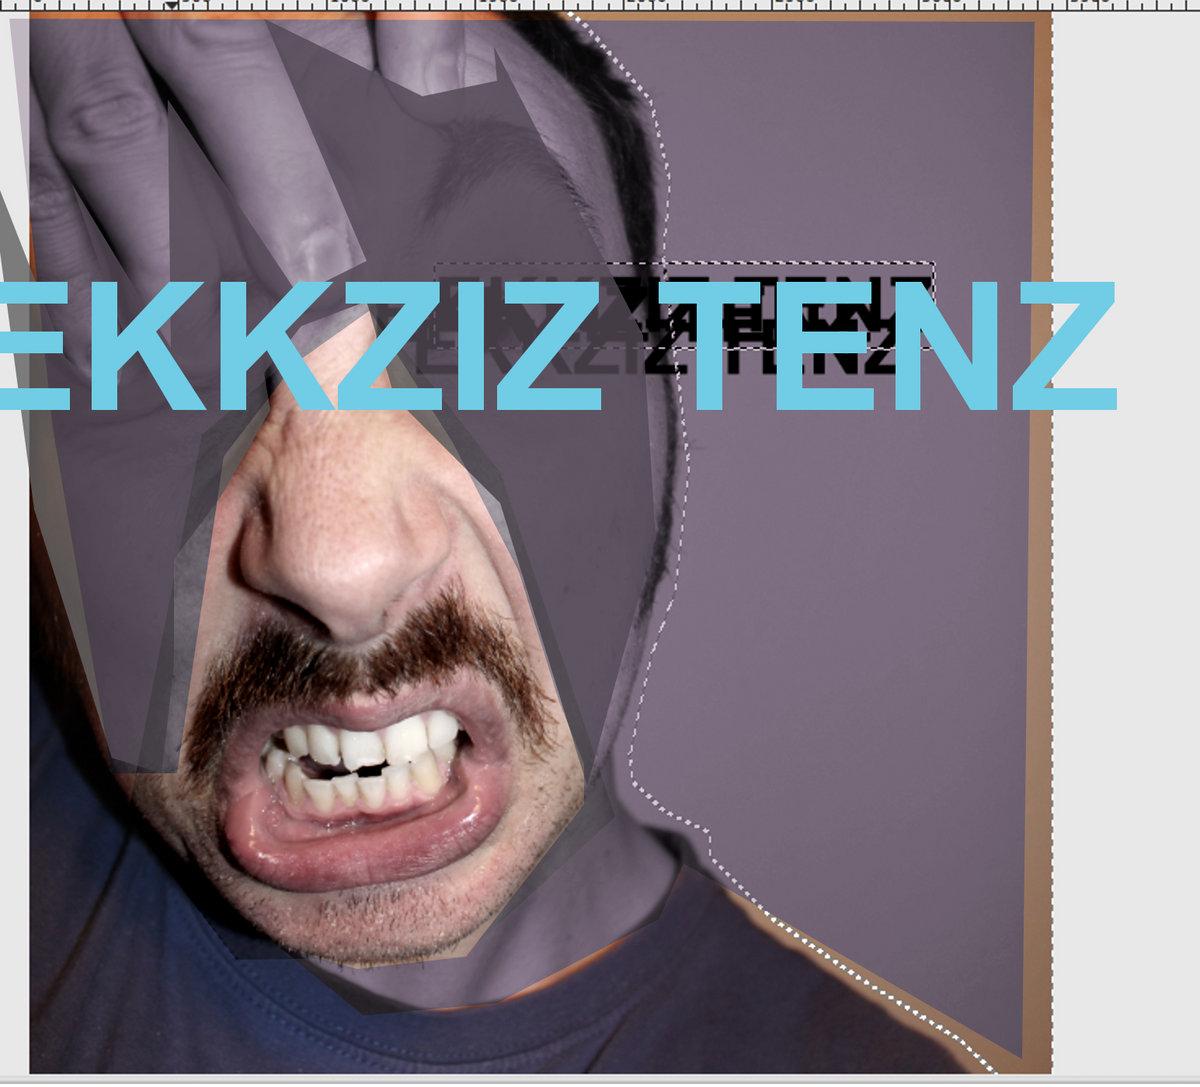 From Aufnahmen Live   Sessions (Vol. 1)   Ausgraben Ausatmen By Ekkziz Tenz